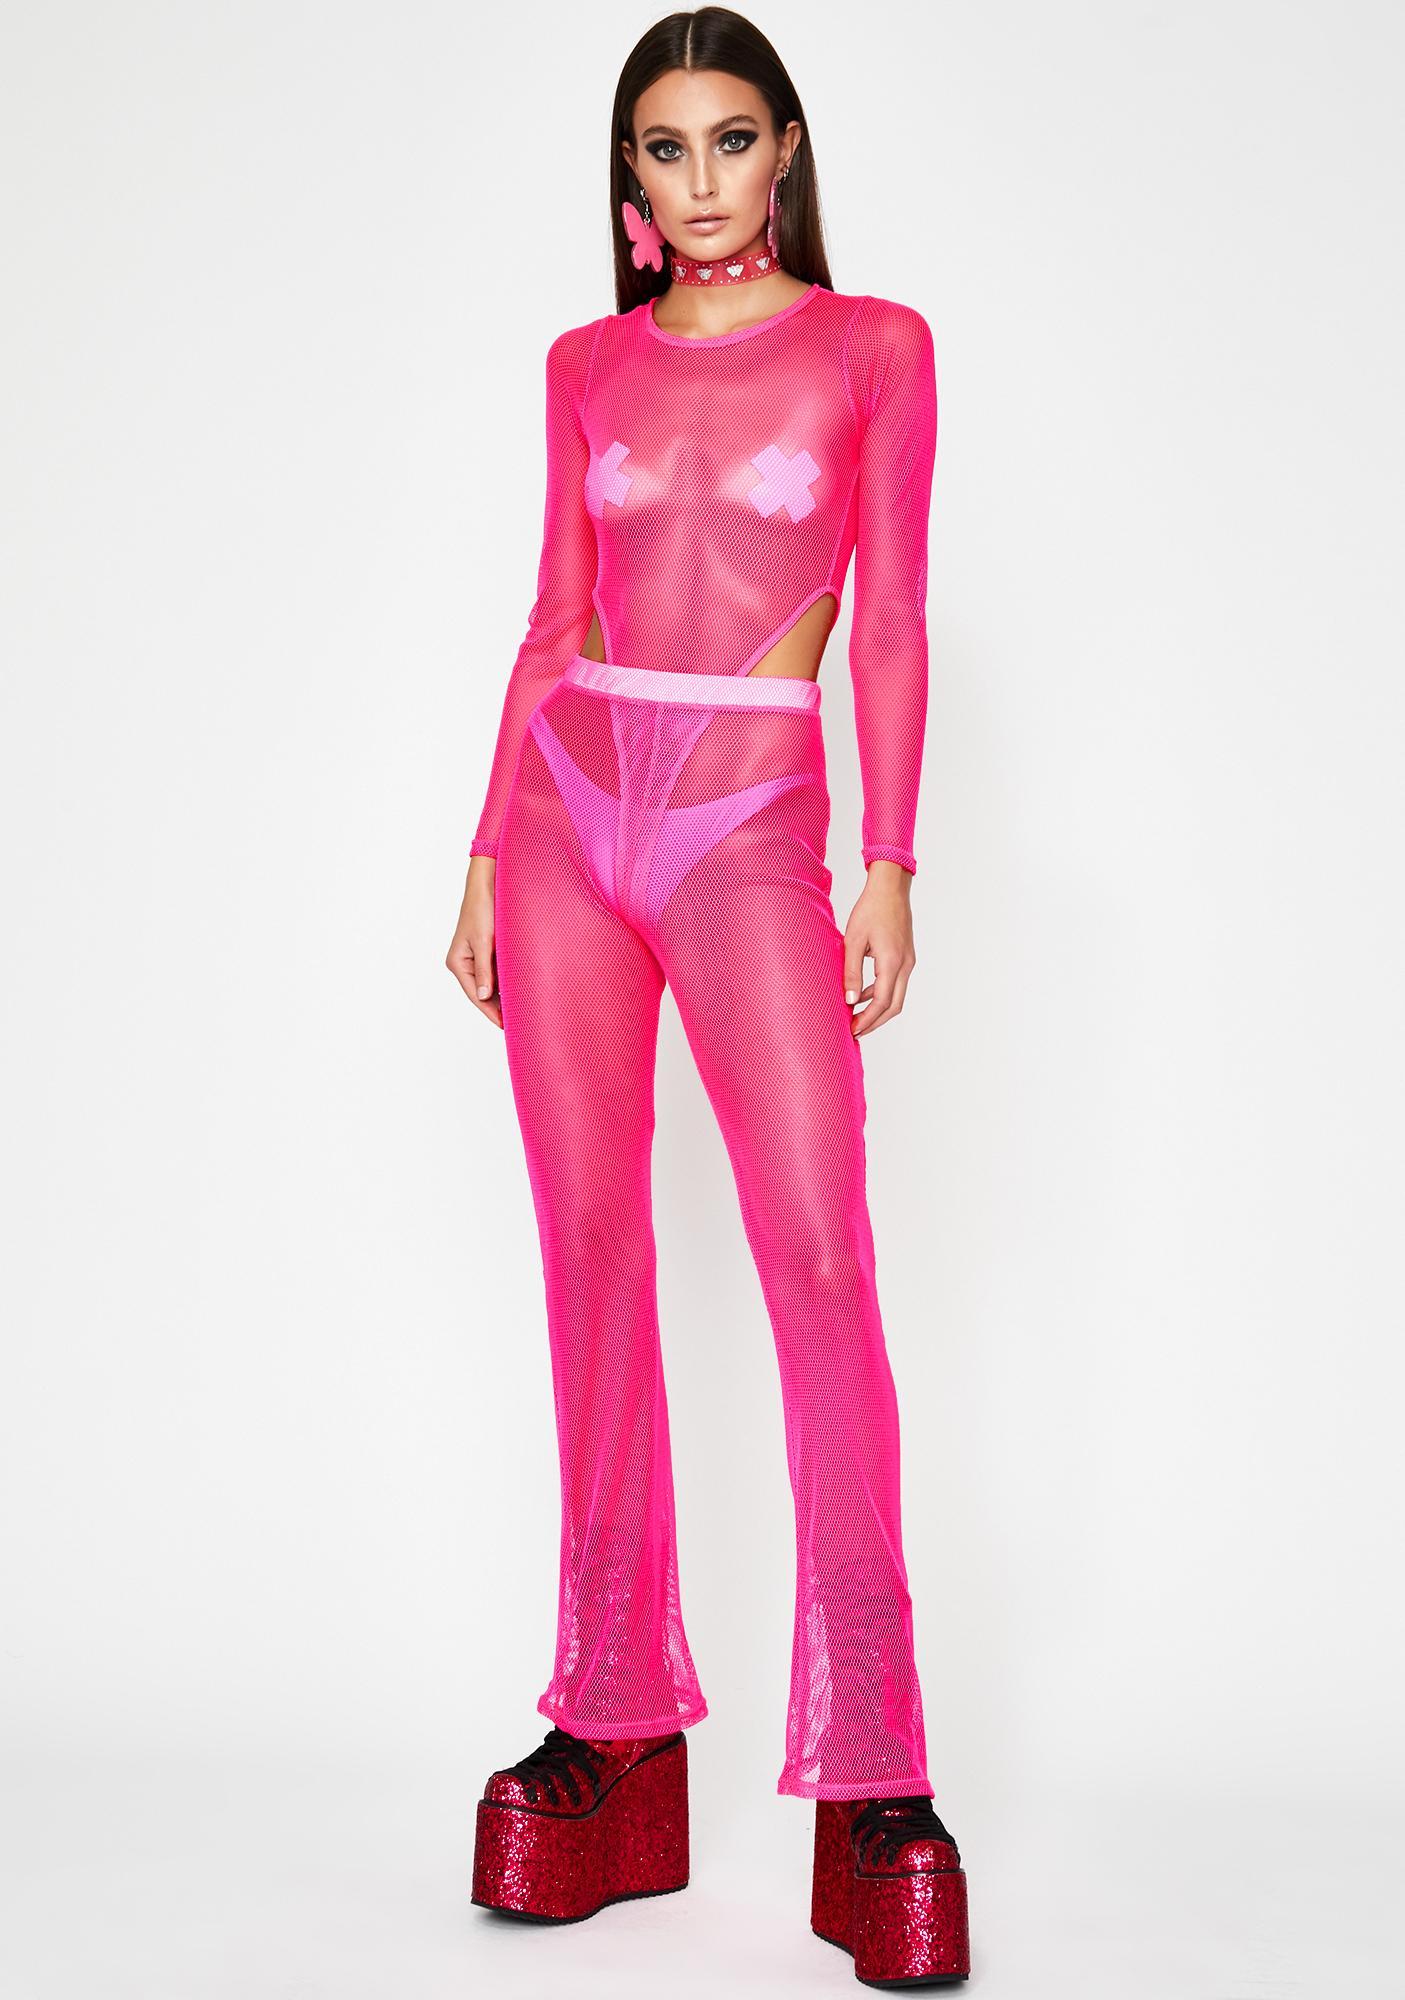 Candy Infinite Illusion Mesh Bodysuit